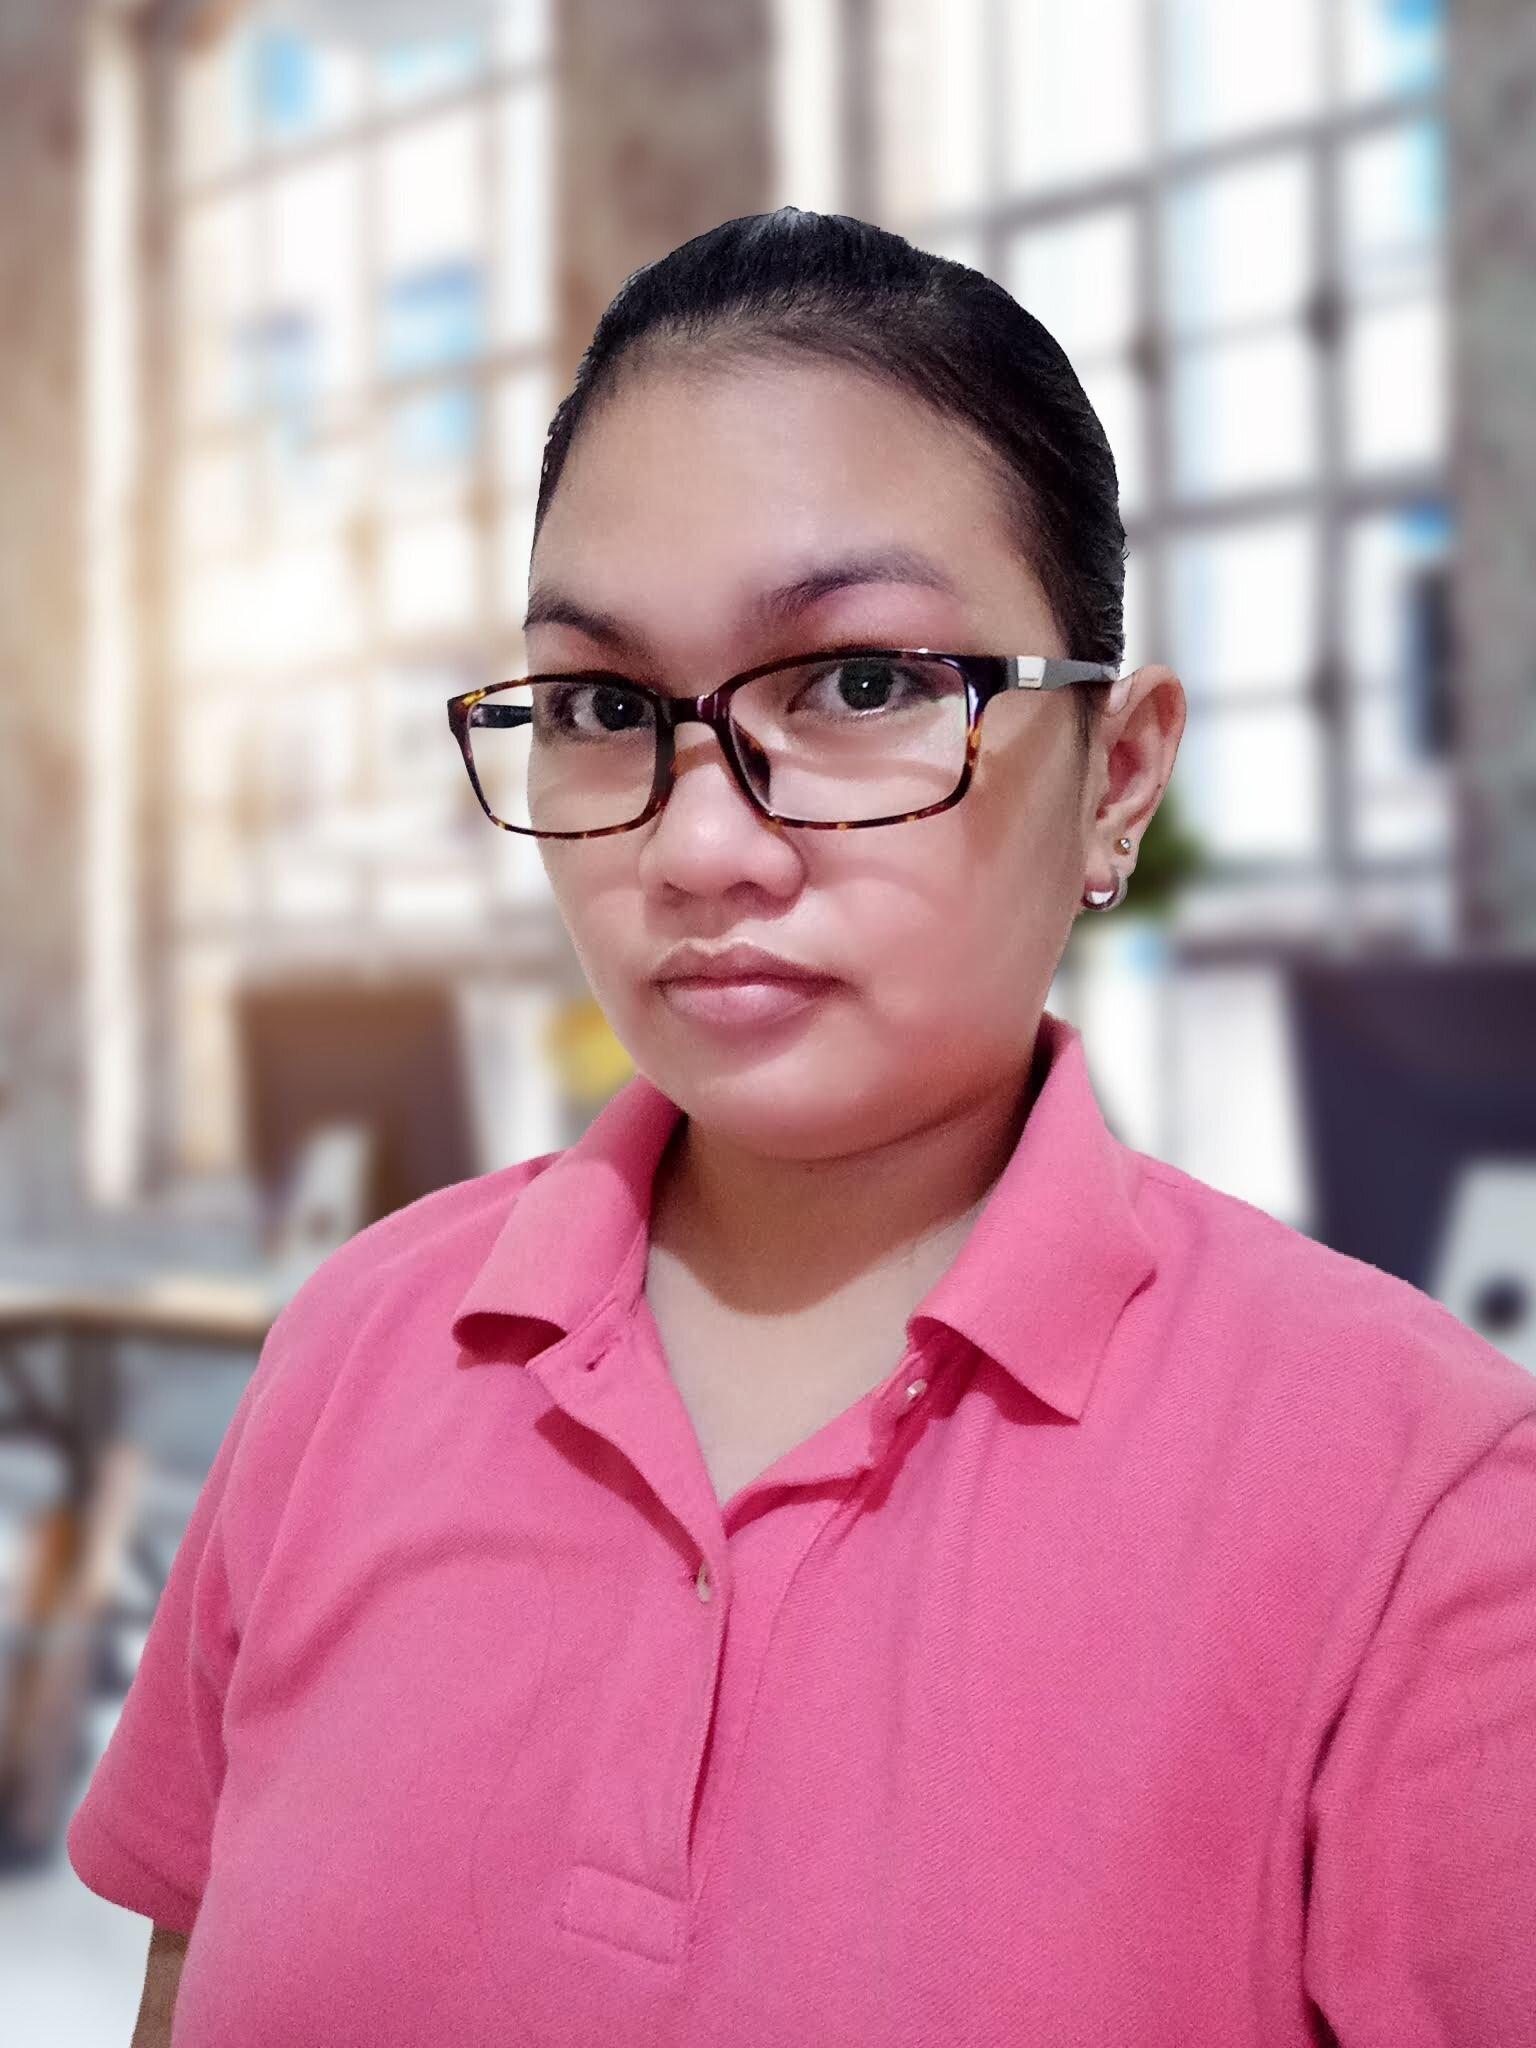 玛拉LISING行政助理myra@vcgrealty.com